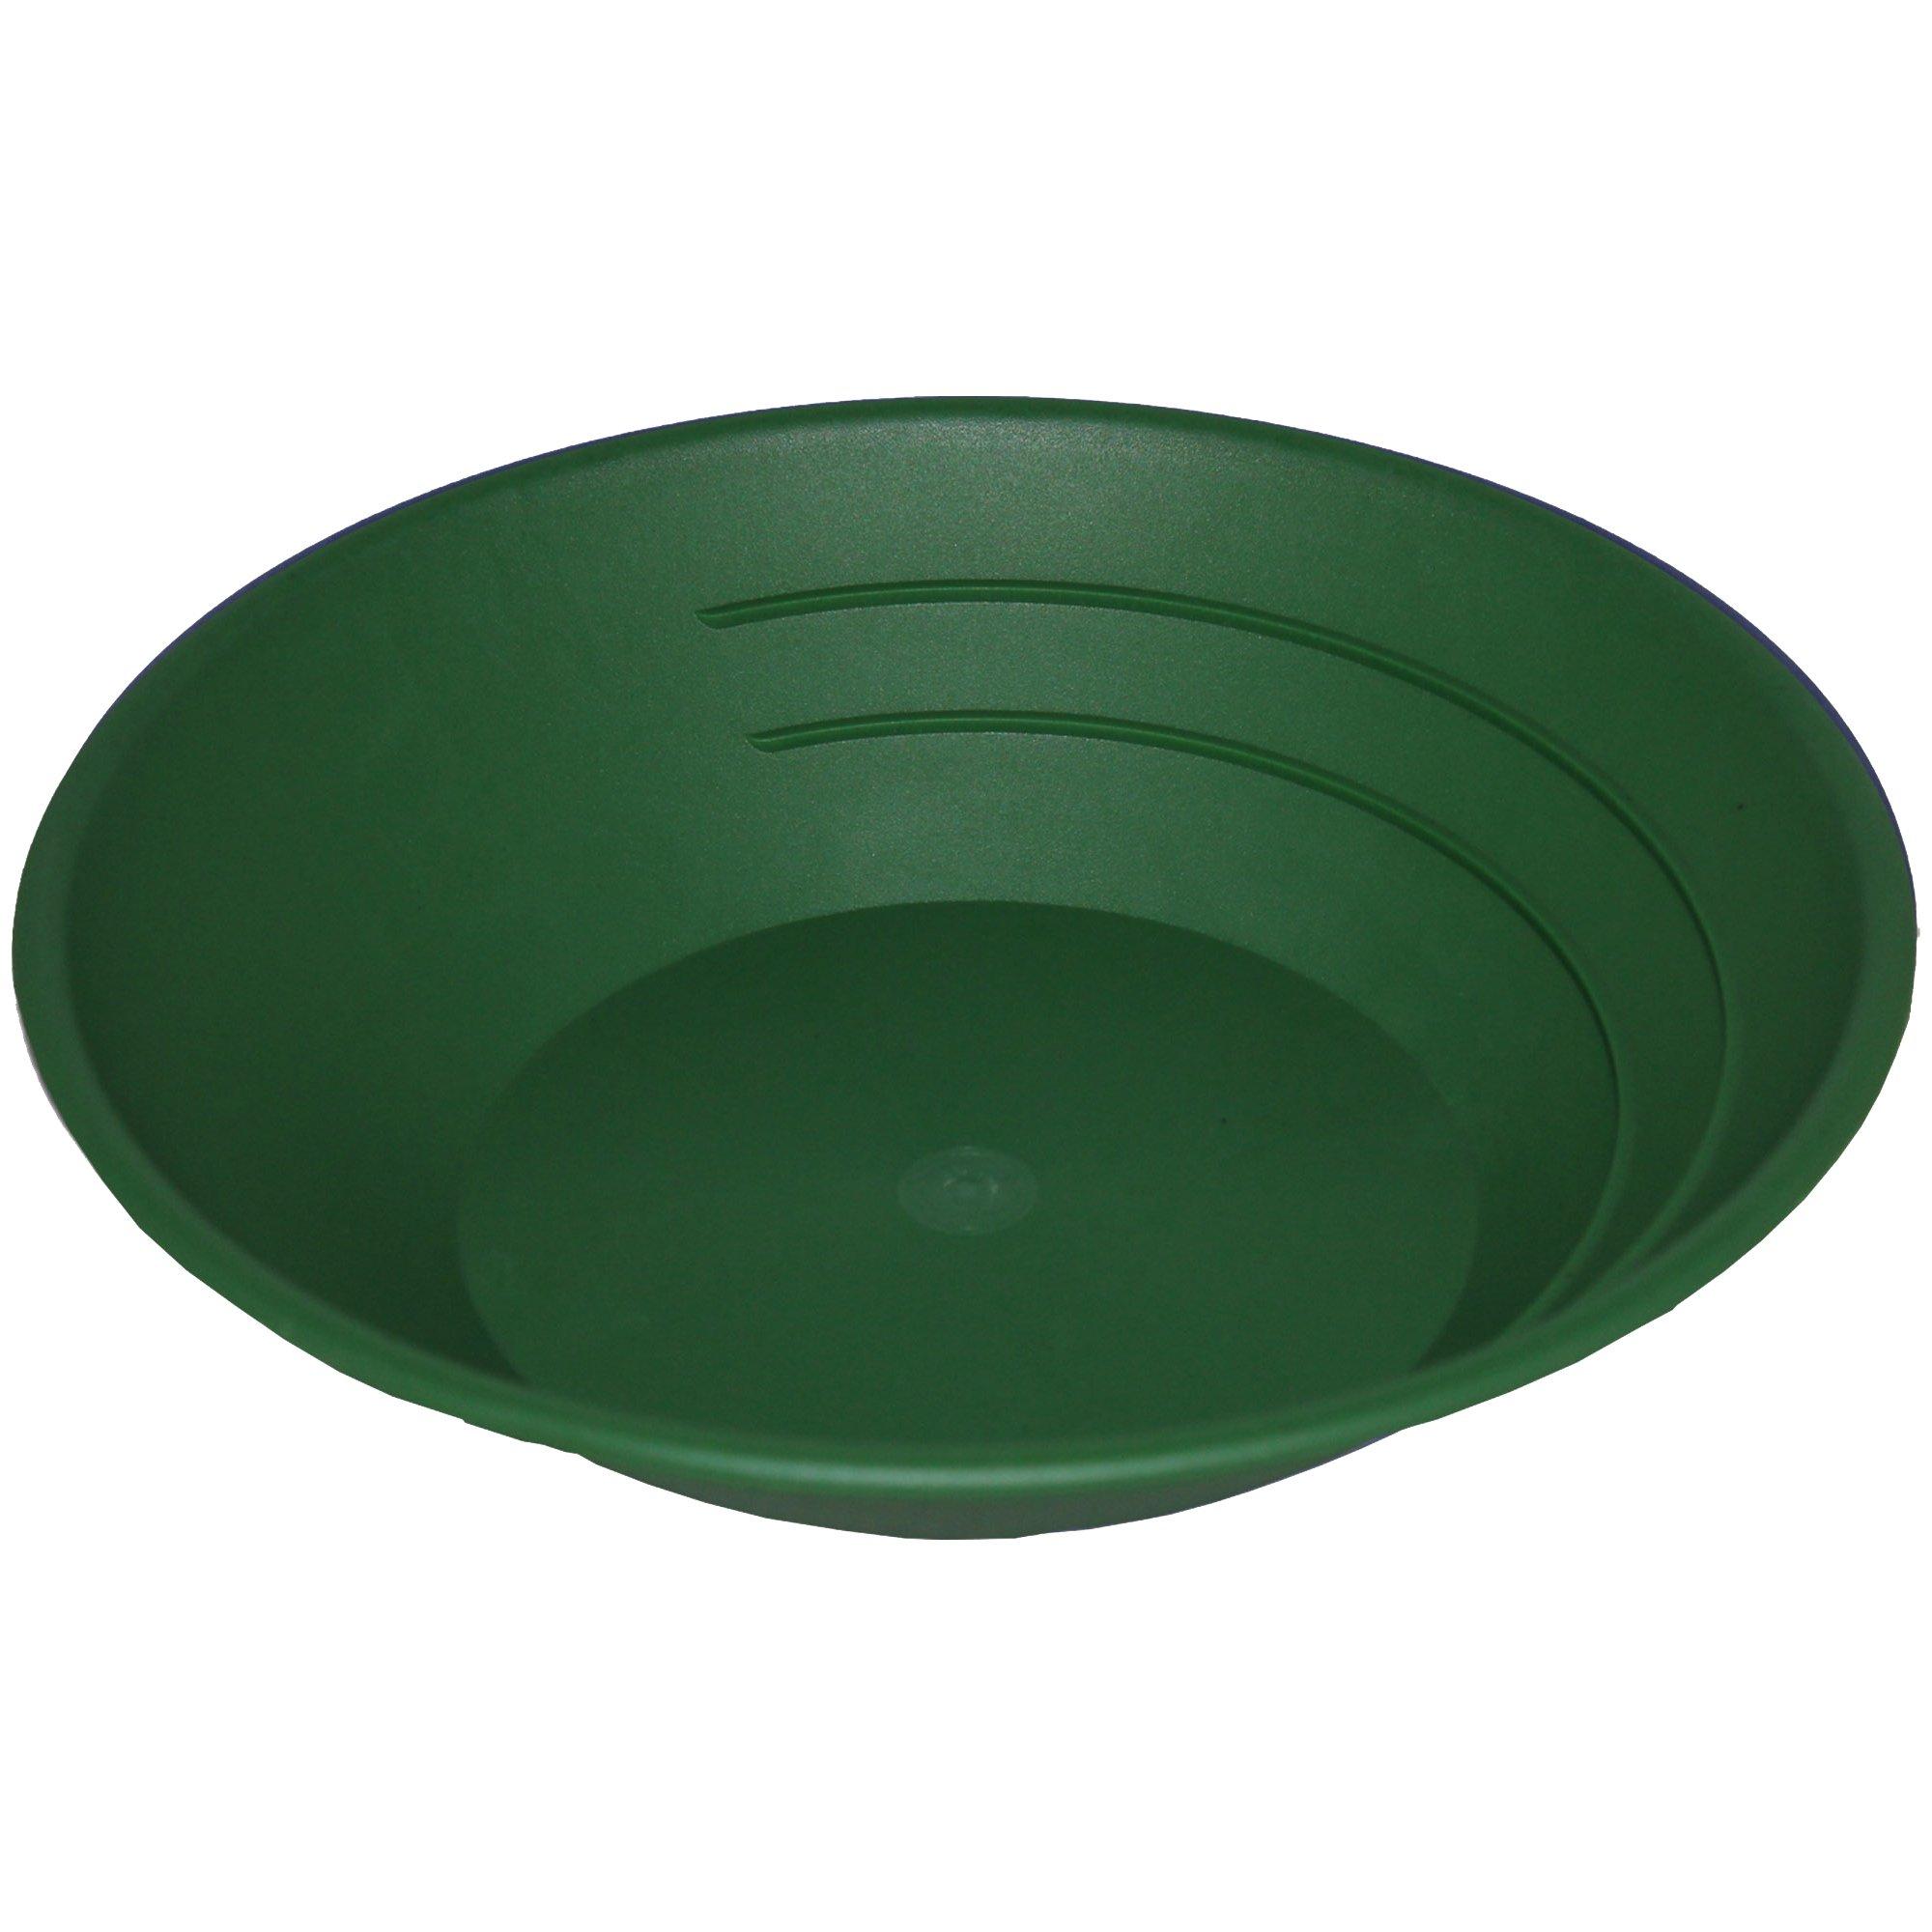 SE GP1001G One Hundred (100) Pack 10'' Green Plastic Gold Pan